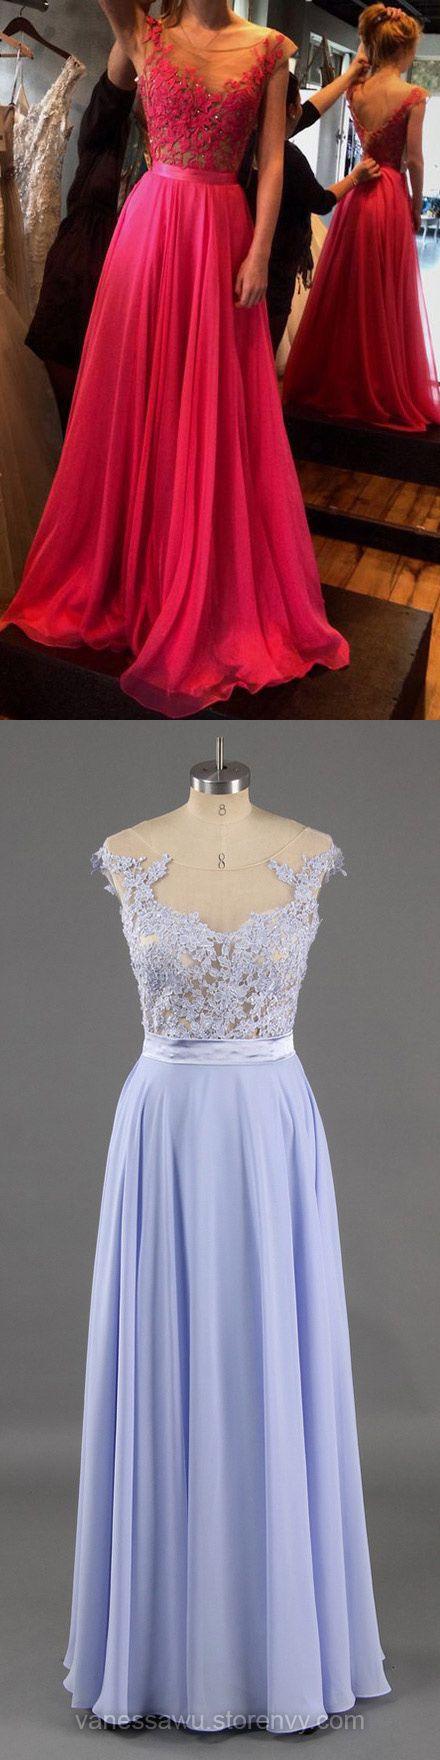 Illusion Prom Dresses, V-Back Long Formal Dresses, Floral Lace Illusion Prom Dresses, Long Evening Dresses